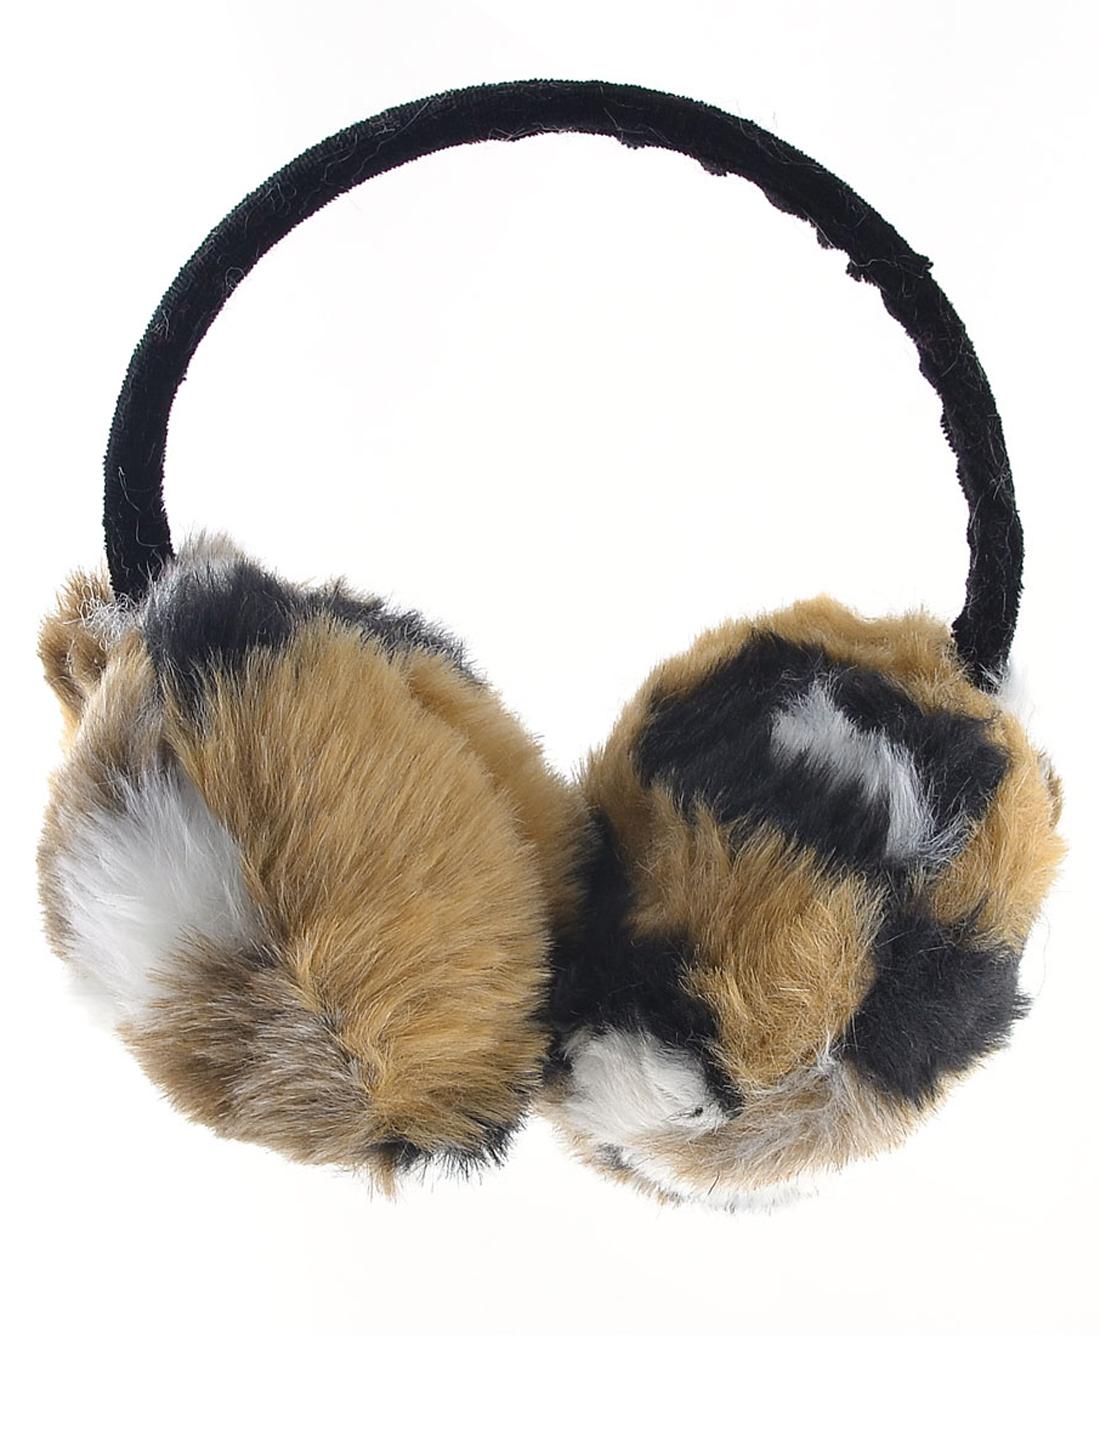 Brown White Black Plush Ear Winter Warmer Round Earmuffs for Lady Man